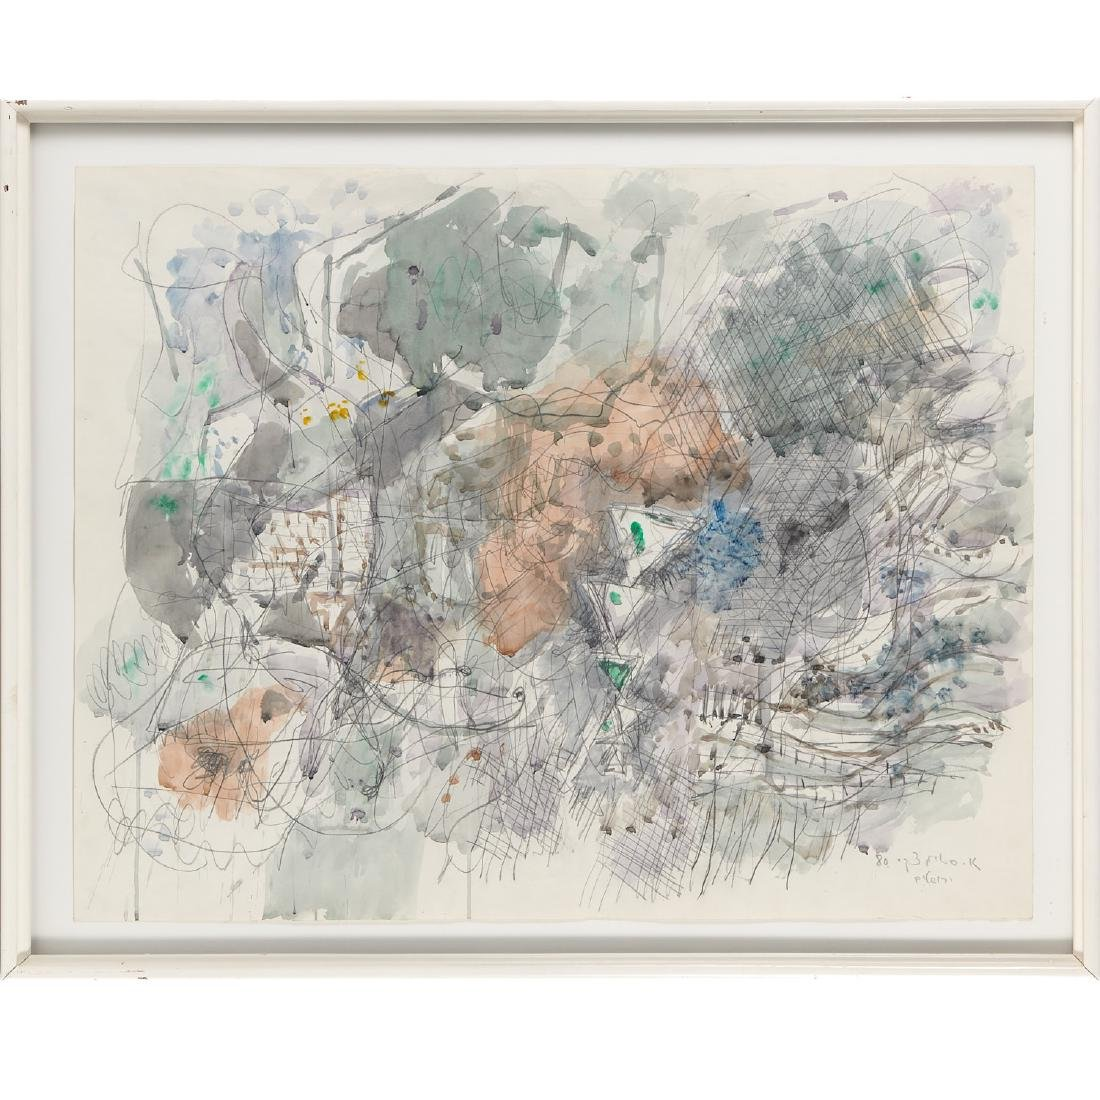 Avigdor Stematzky, Abstract Landscape, 1980